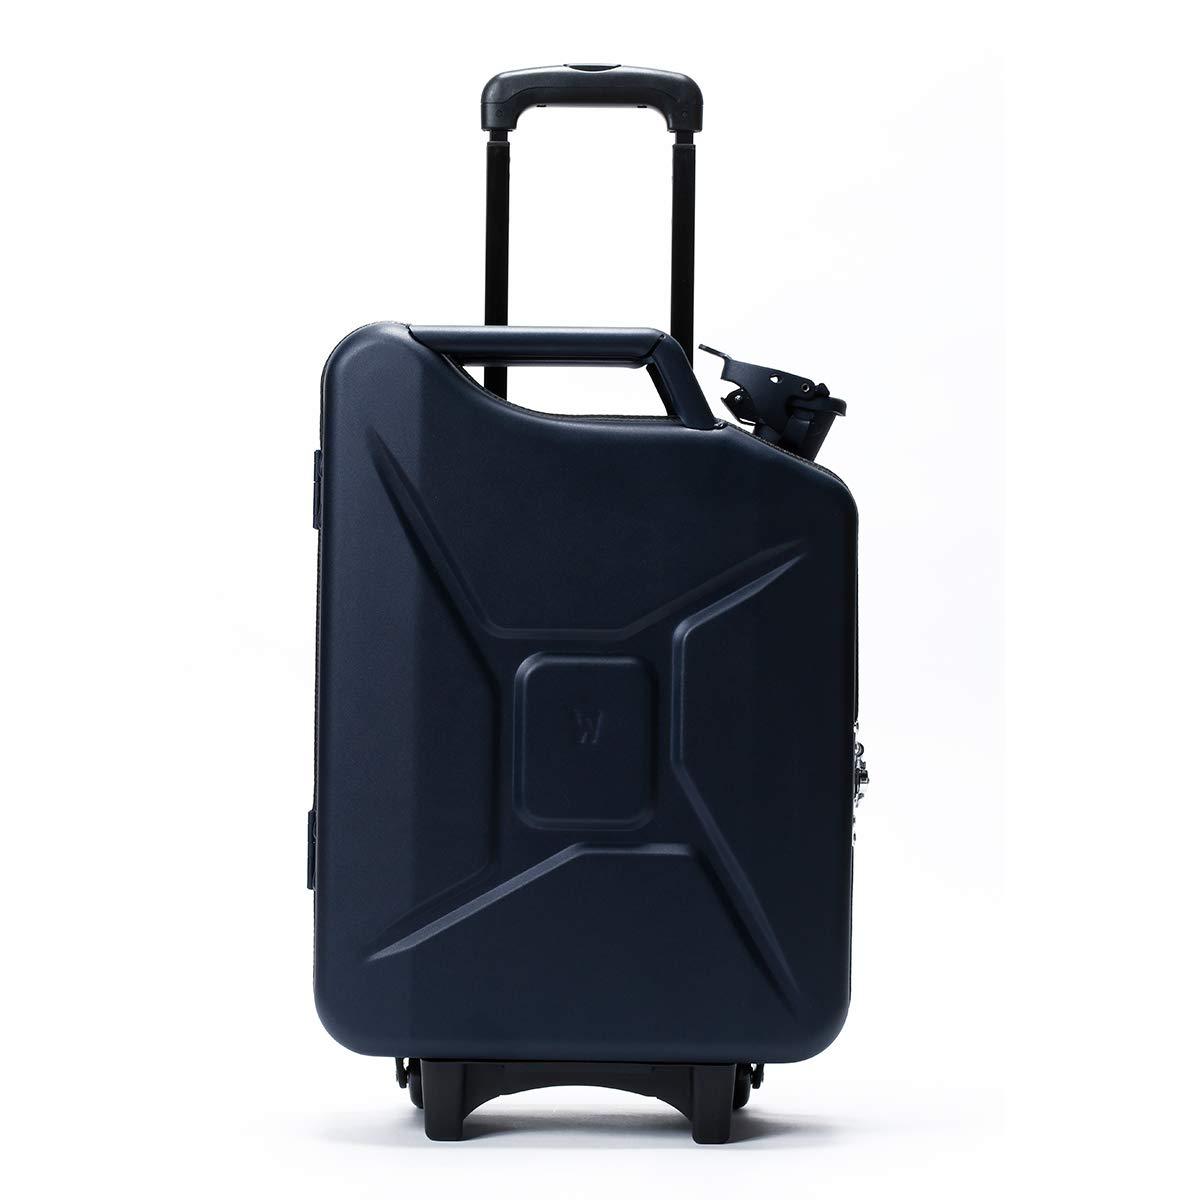 G-CASE(ジーケース) キャリーケース ミッドナイトブルー B07J3Y22TH